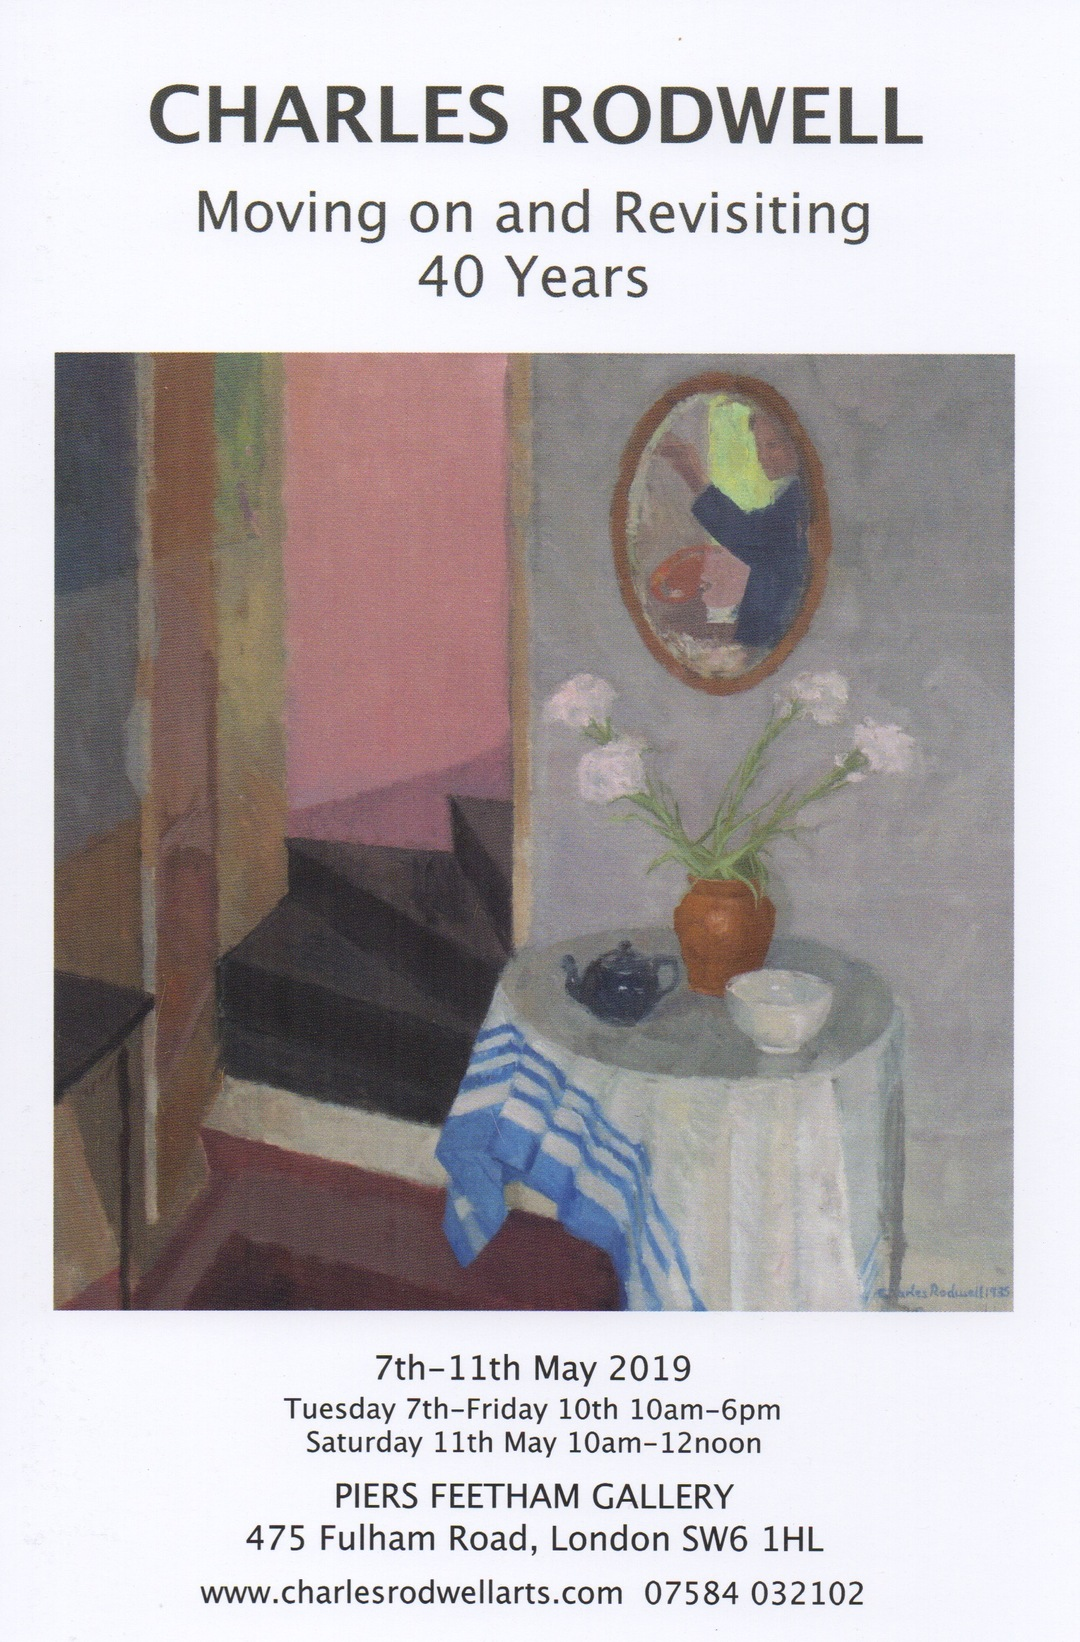 5ea92318 Charles Rodwell Moving on and Revisiting 40 Years. 7th-11th May at ...